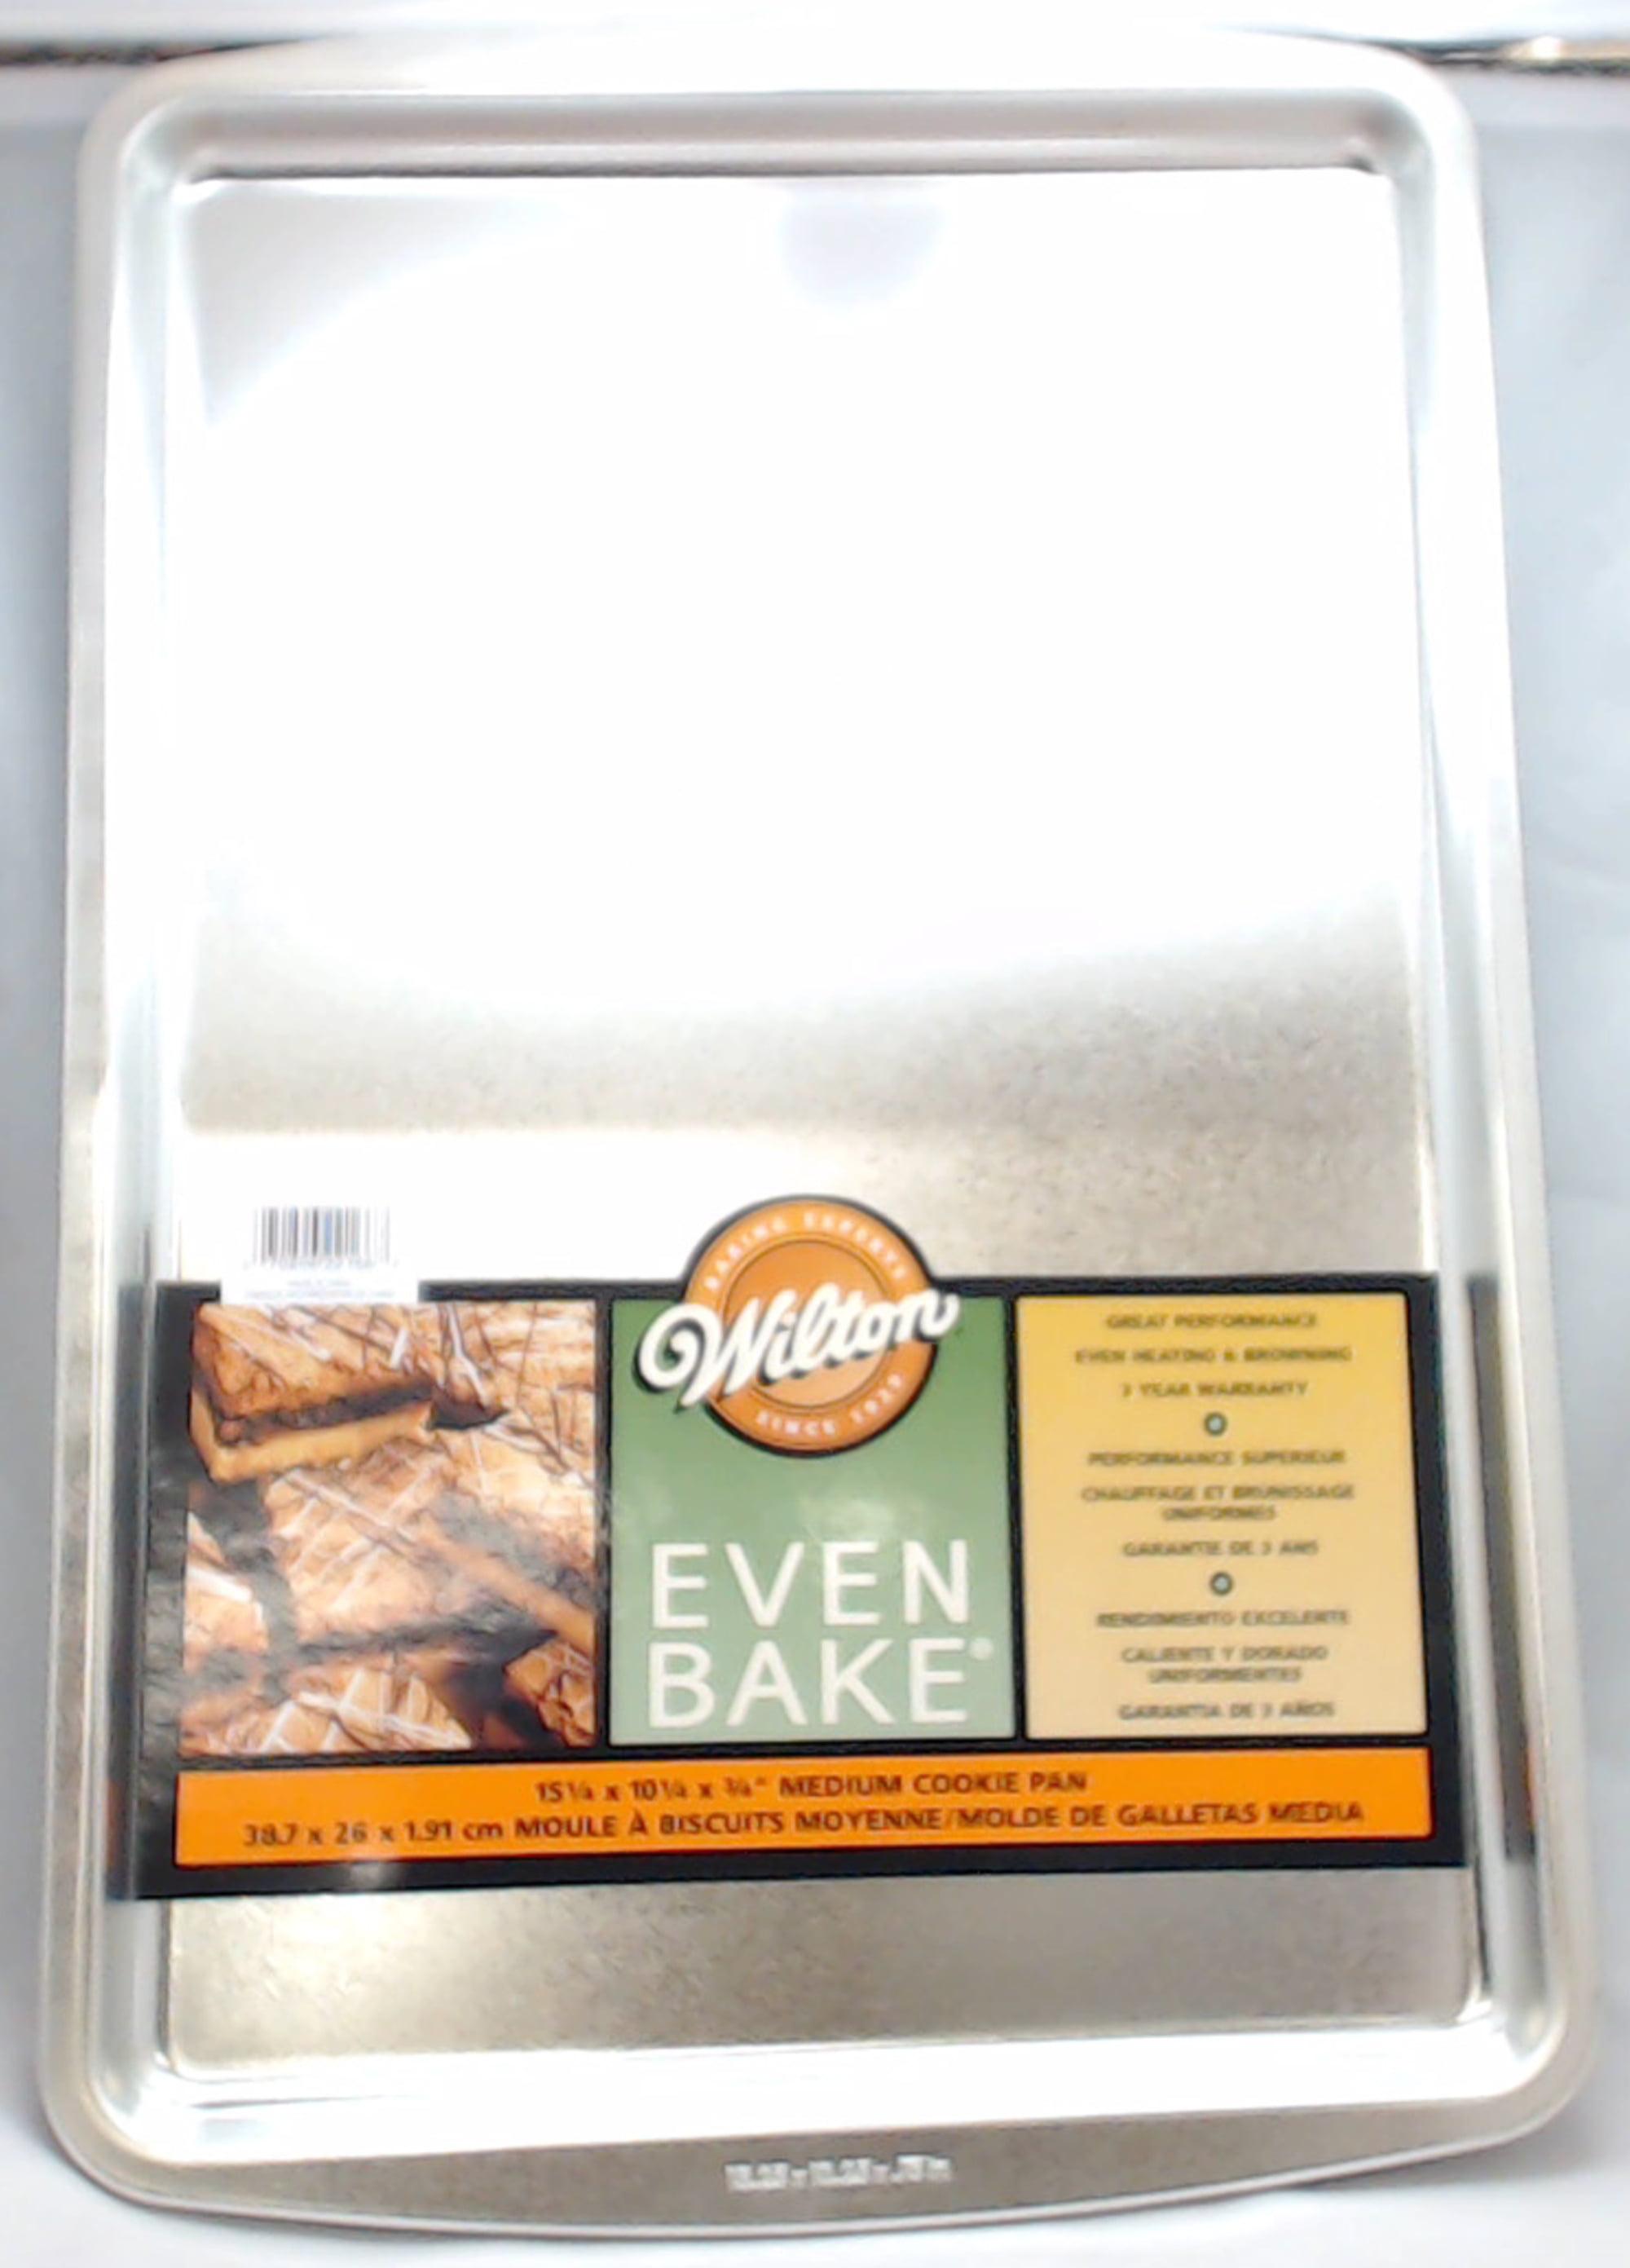 2105-2166, Wilton Even Bake Medium Cookie Pan, 15-1 4 X 10-1 4 X 3 4 by